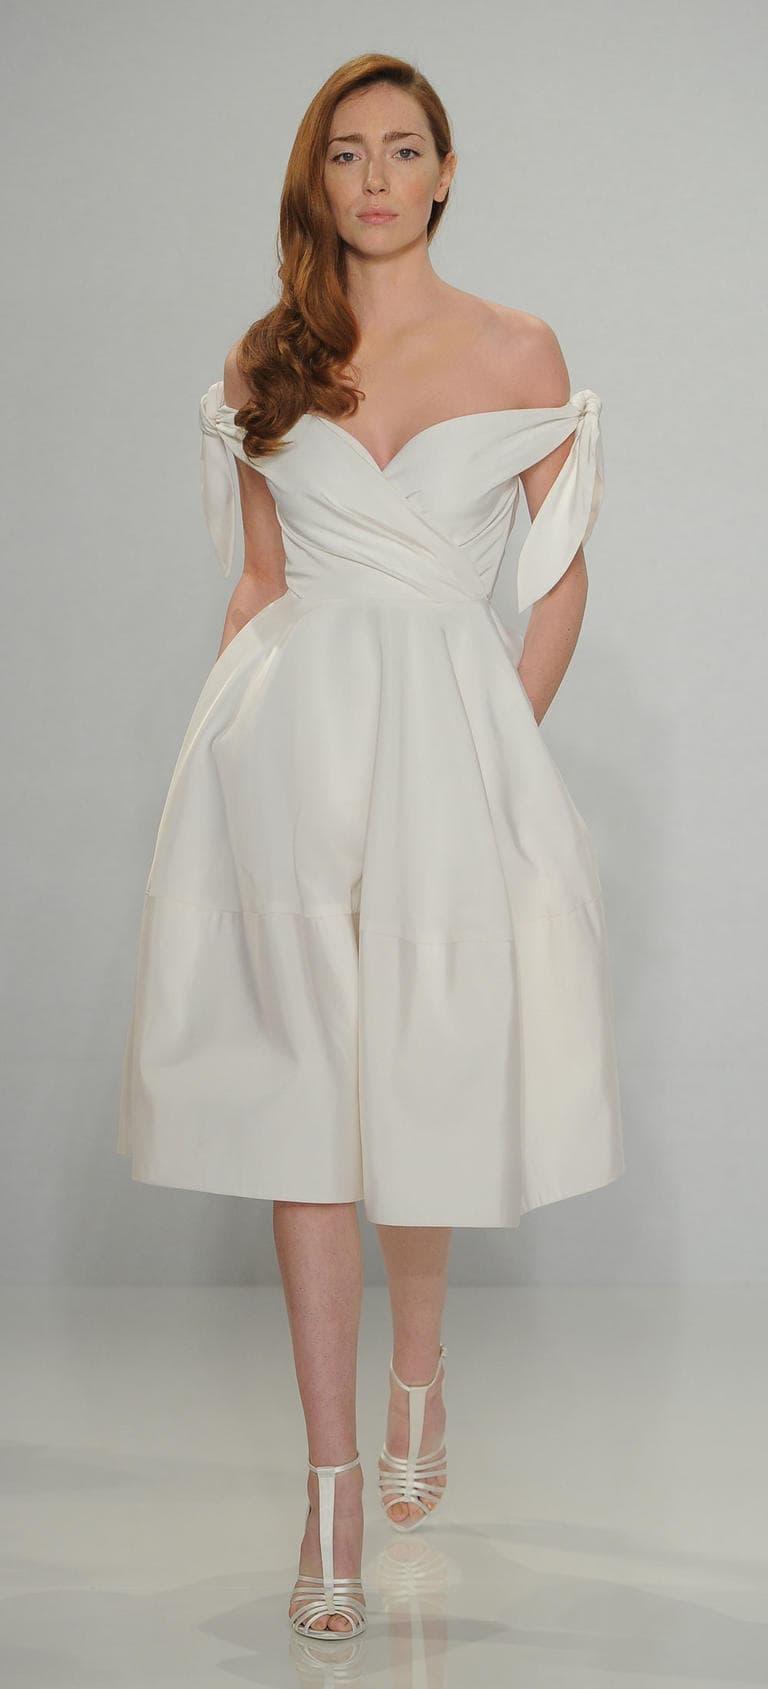 vestido-noiva-casamento-praia-06-min